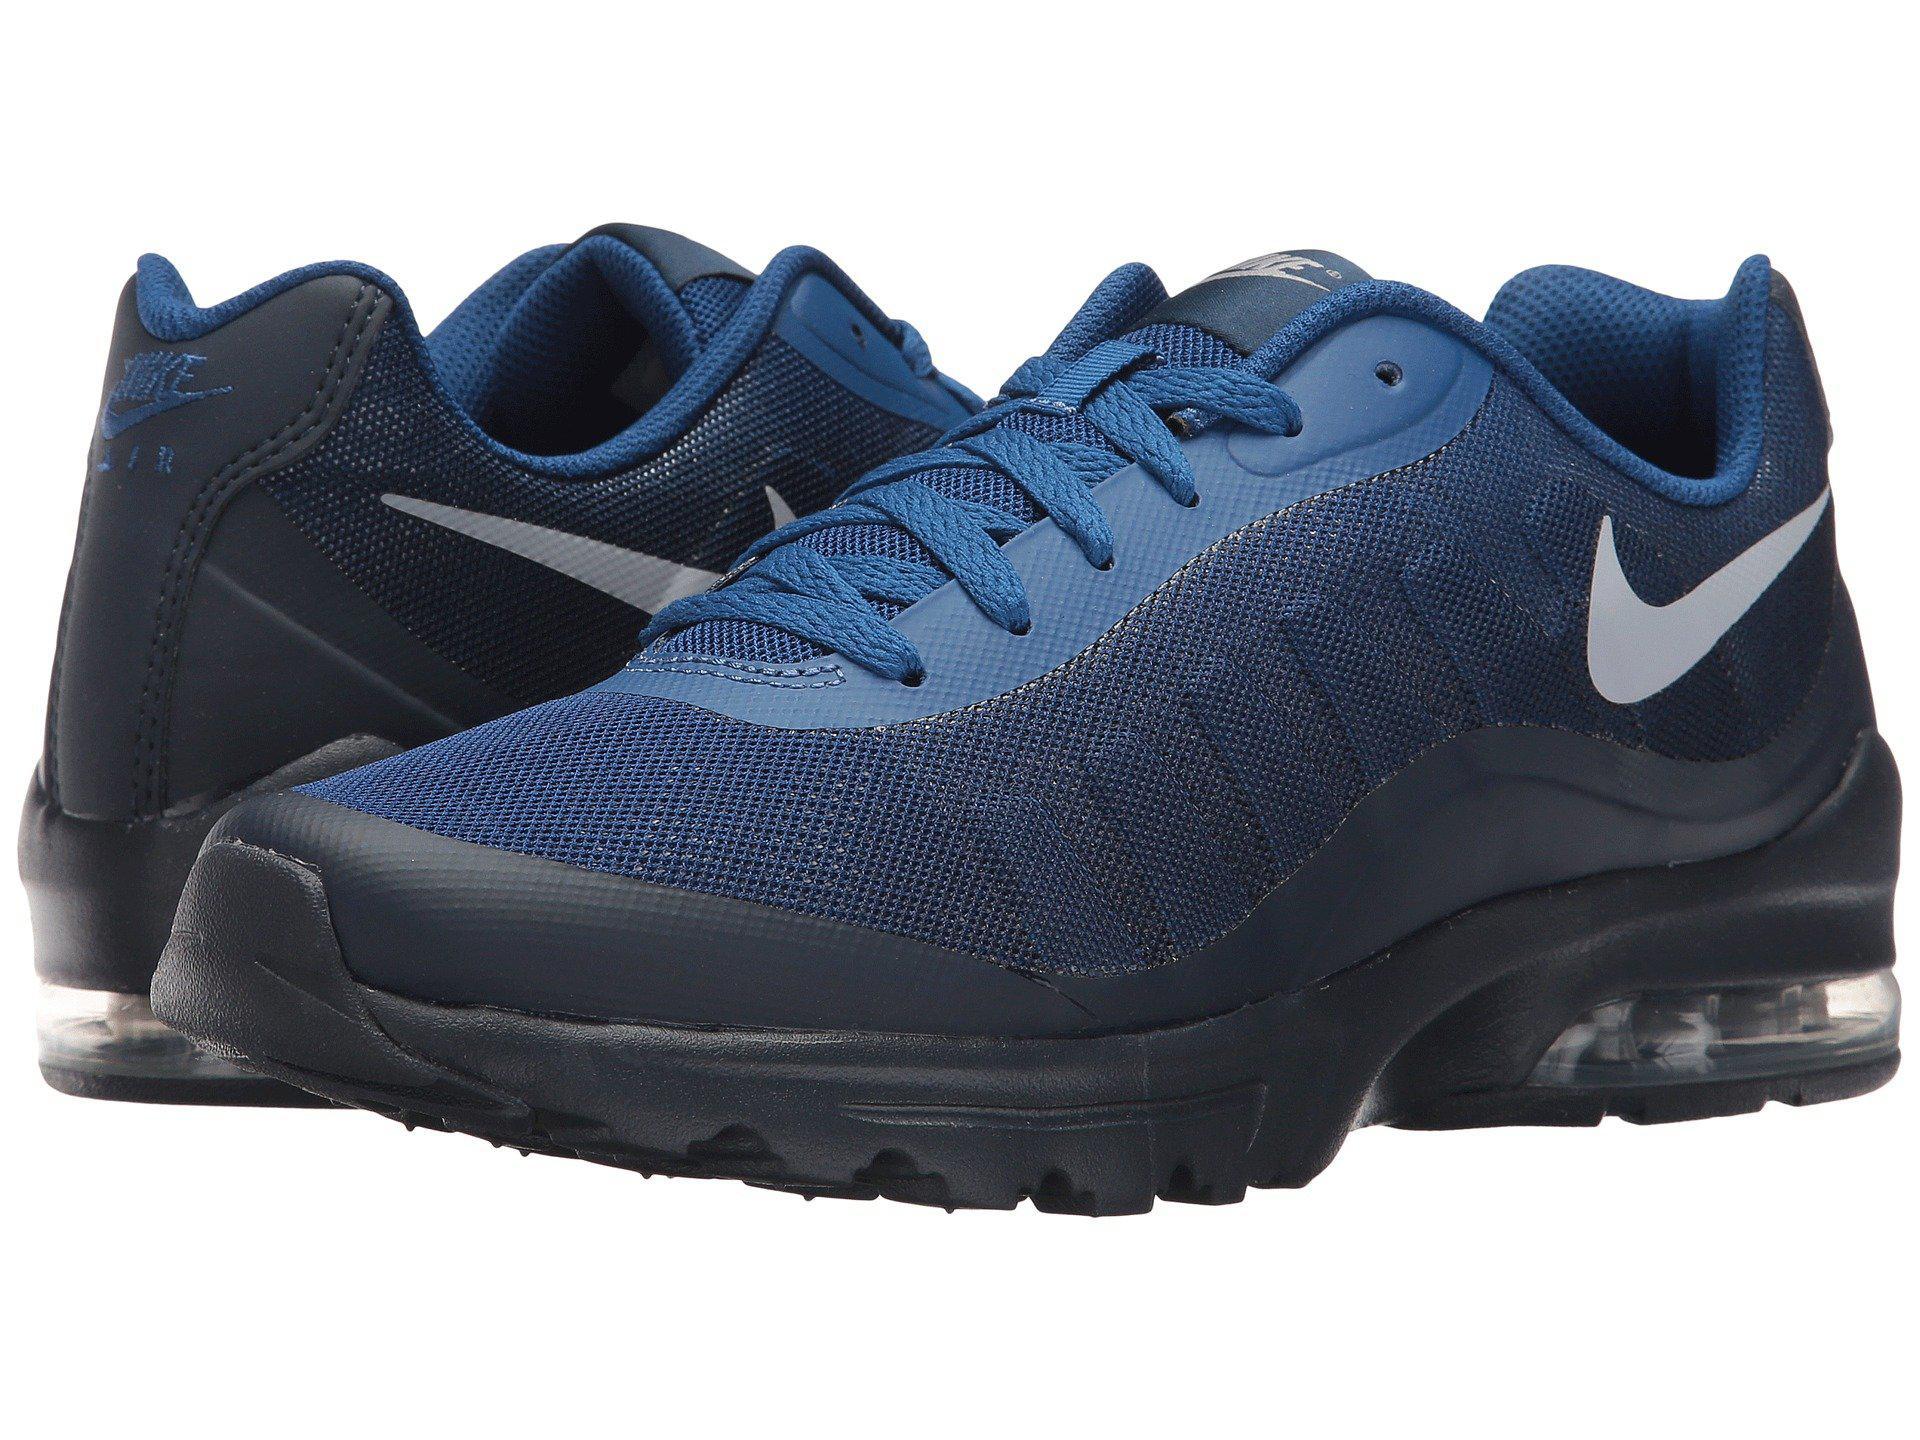 0fe50eec7e Nike Air Max Invigor Print Running Shoe in Blue for Men - Lyst